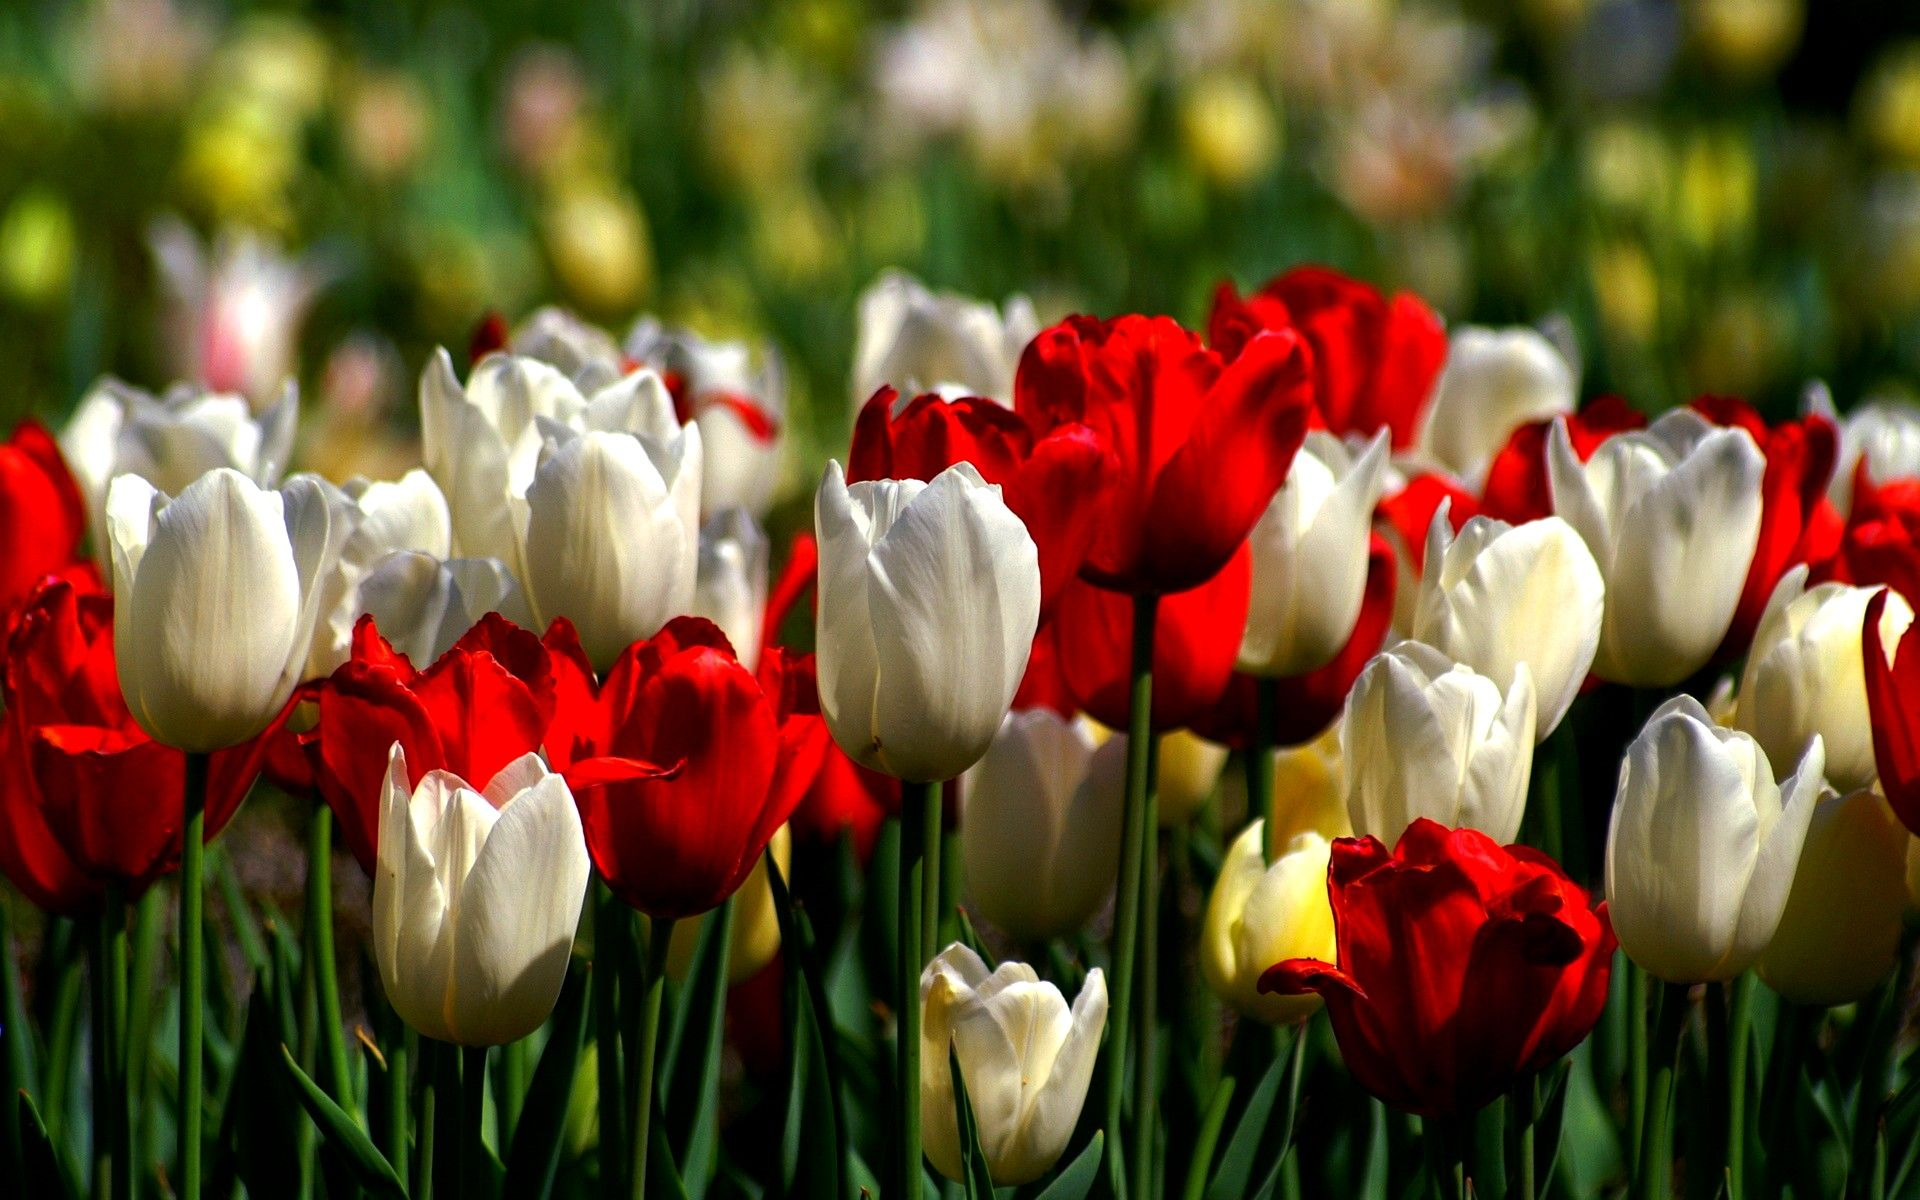 Pink Wallpaper With Cute Puppy Golden Retriever Beautiful Tulip Garden Wallpapers Flower Tulip